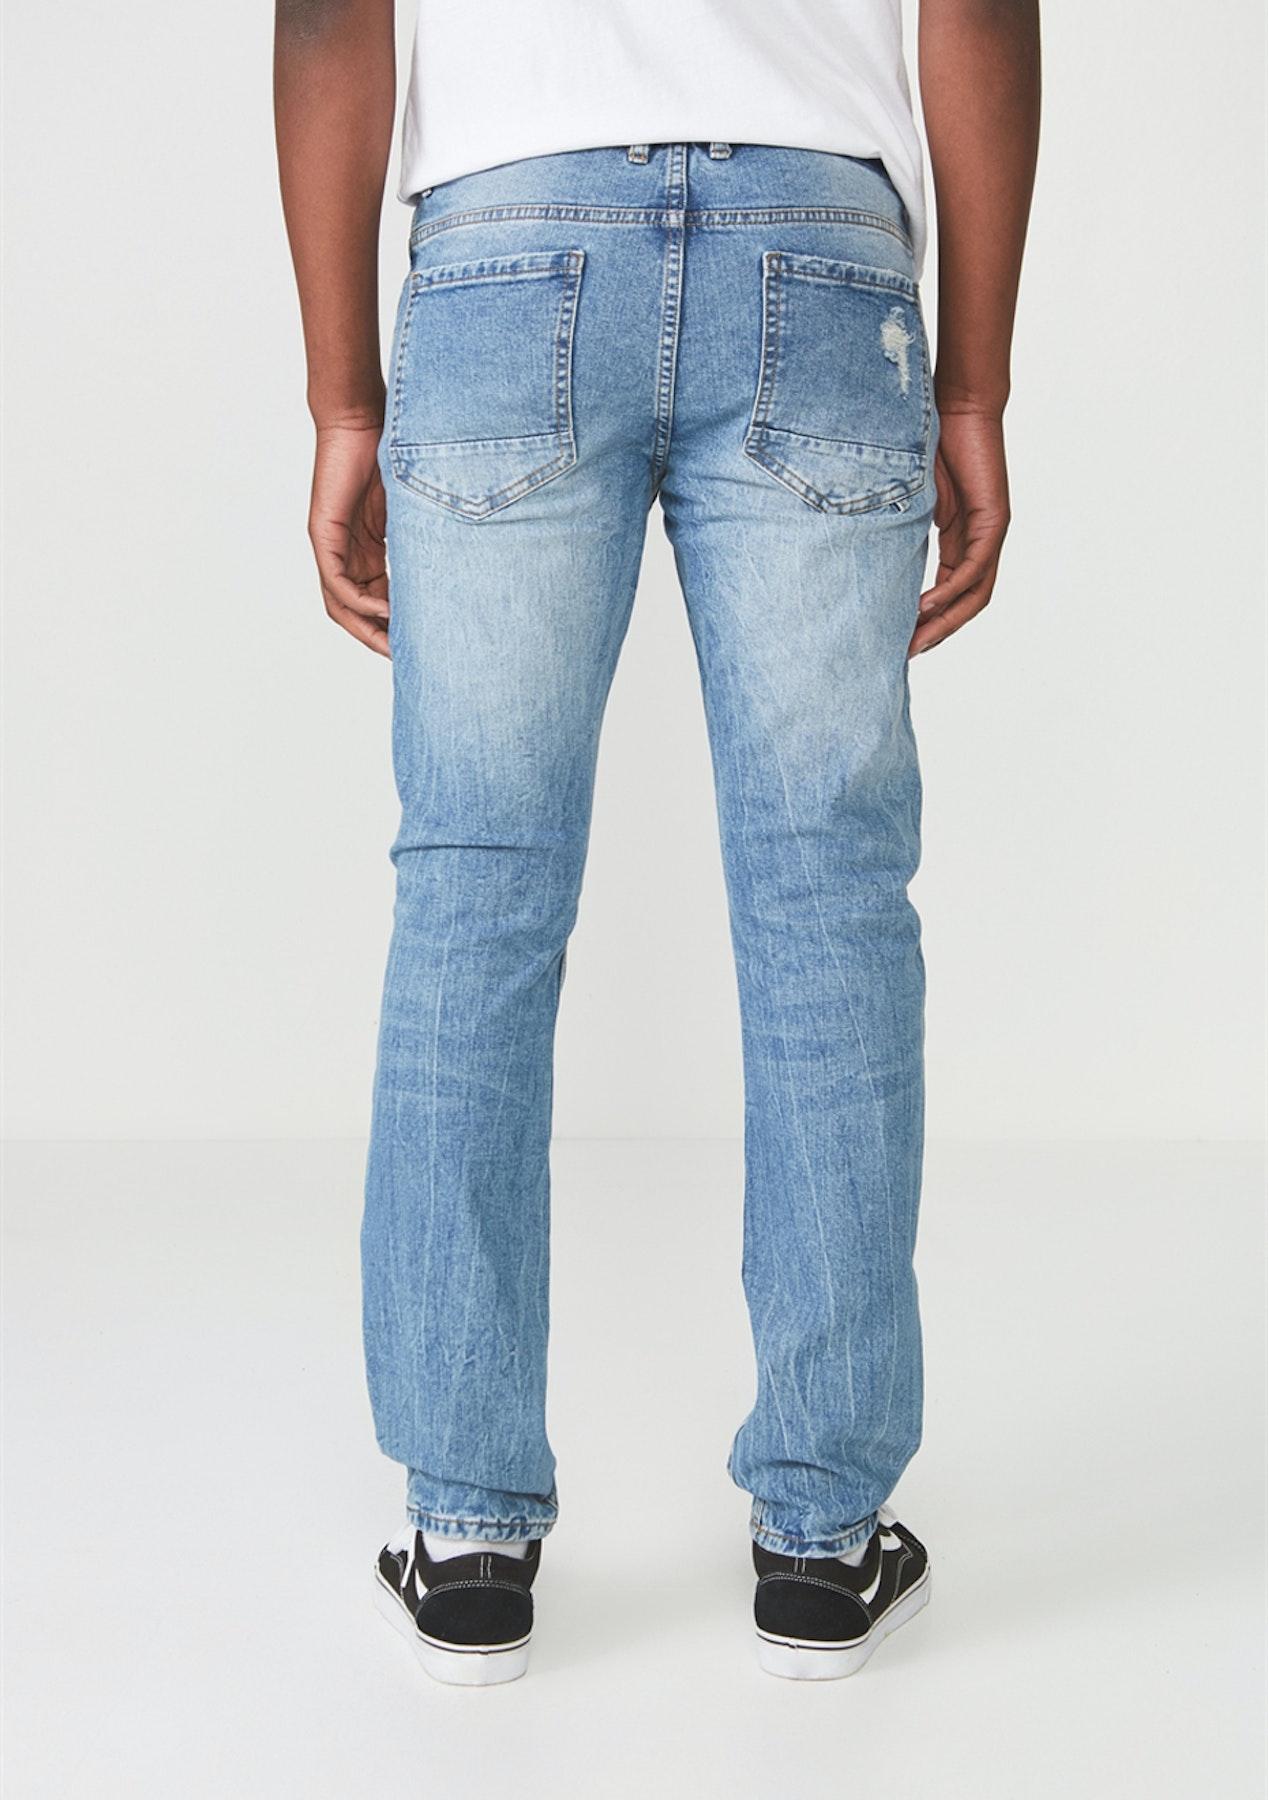 33231f41 Cotton On - Slim Fit Jean /Vintage Blue Patched - Mens Garage Sale - Onceit